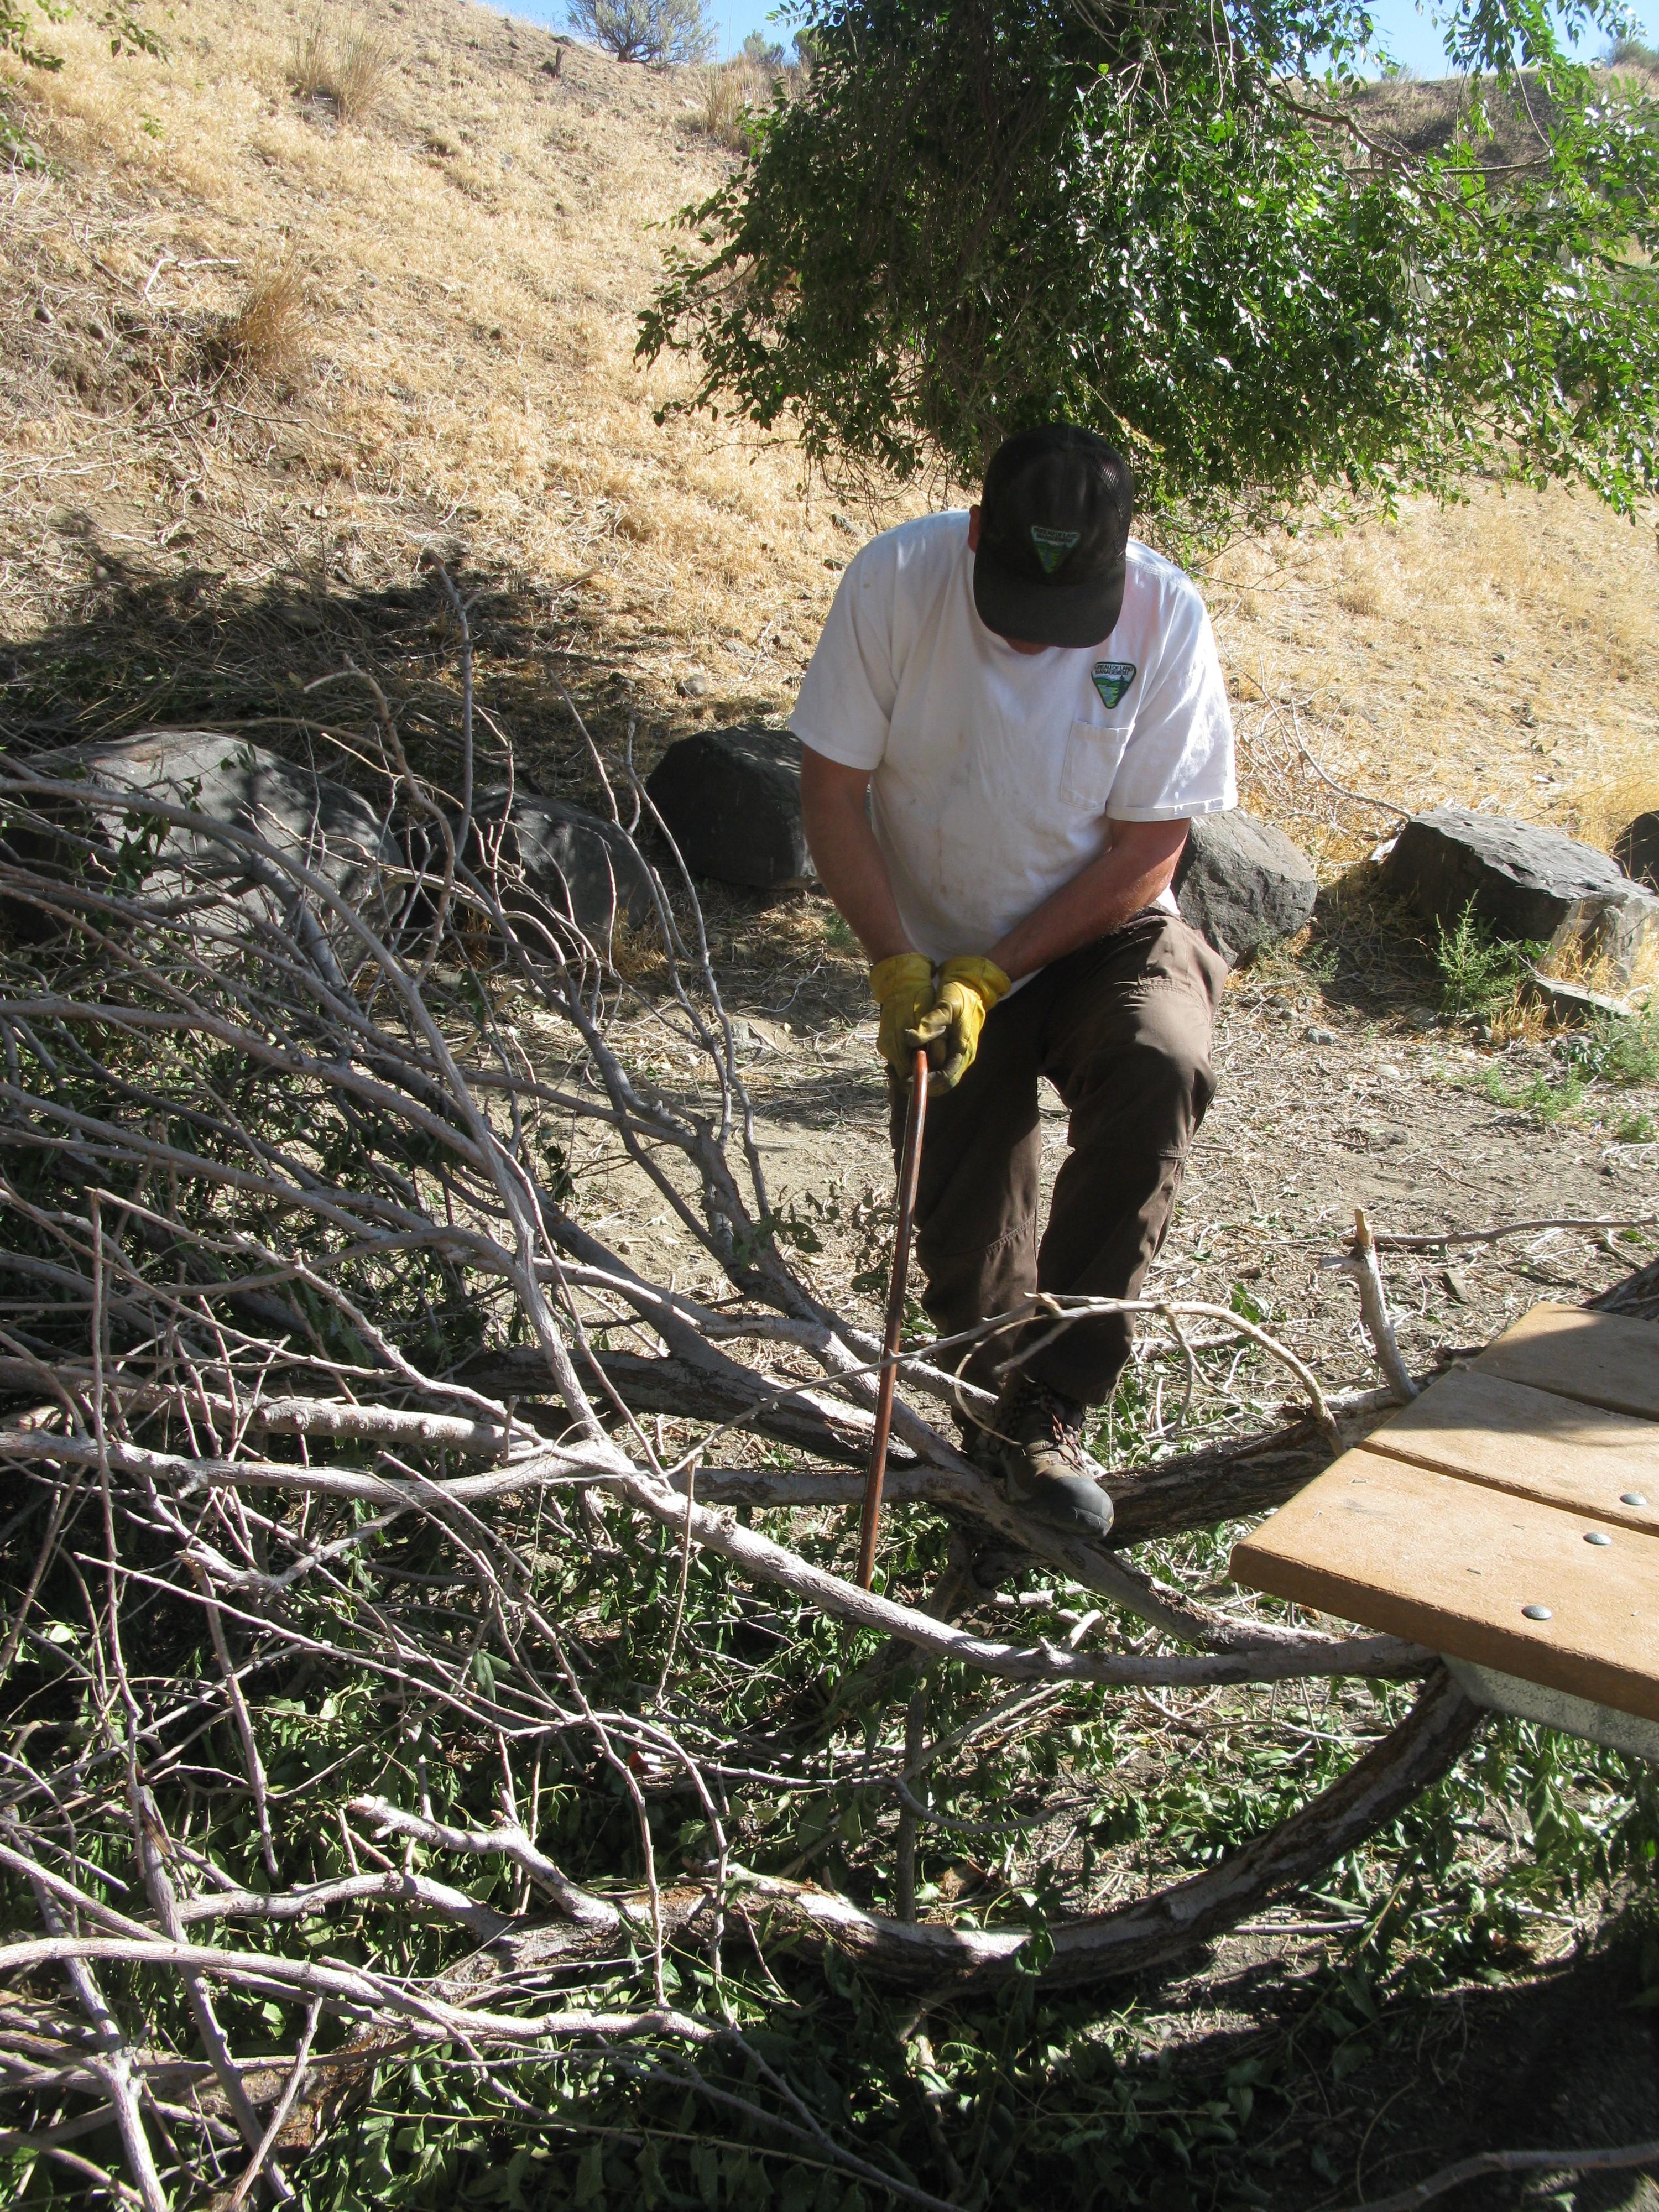 Rusty cutting down a fallen elm tree branch.